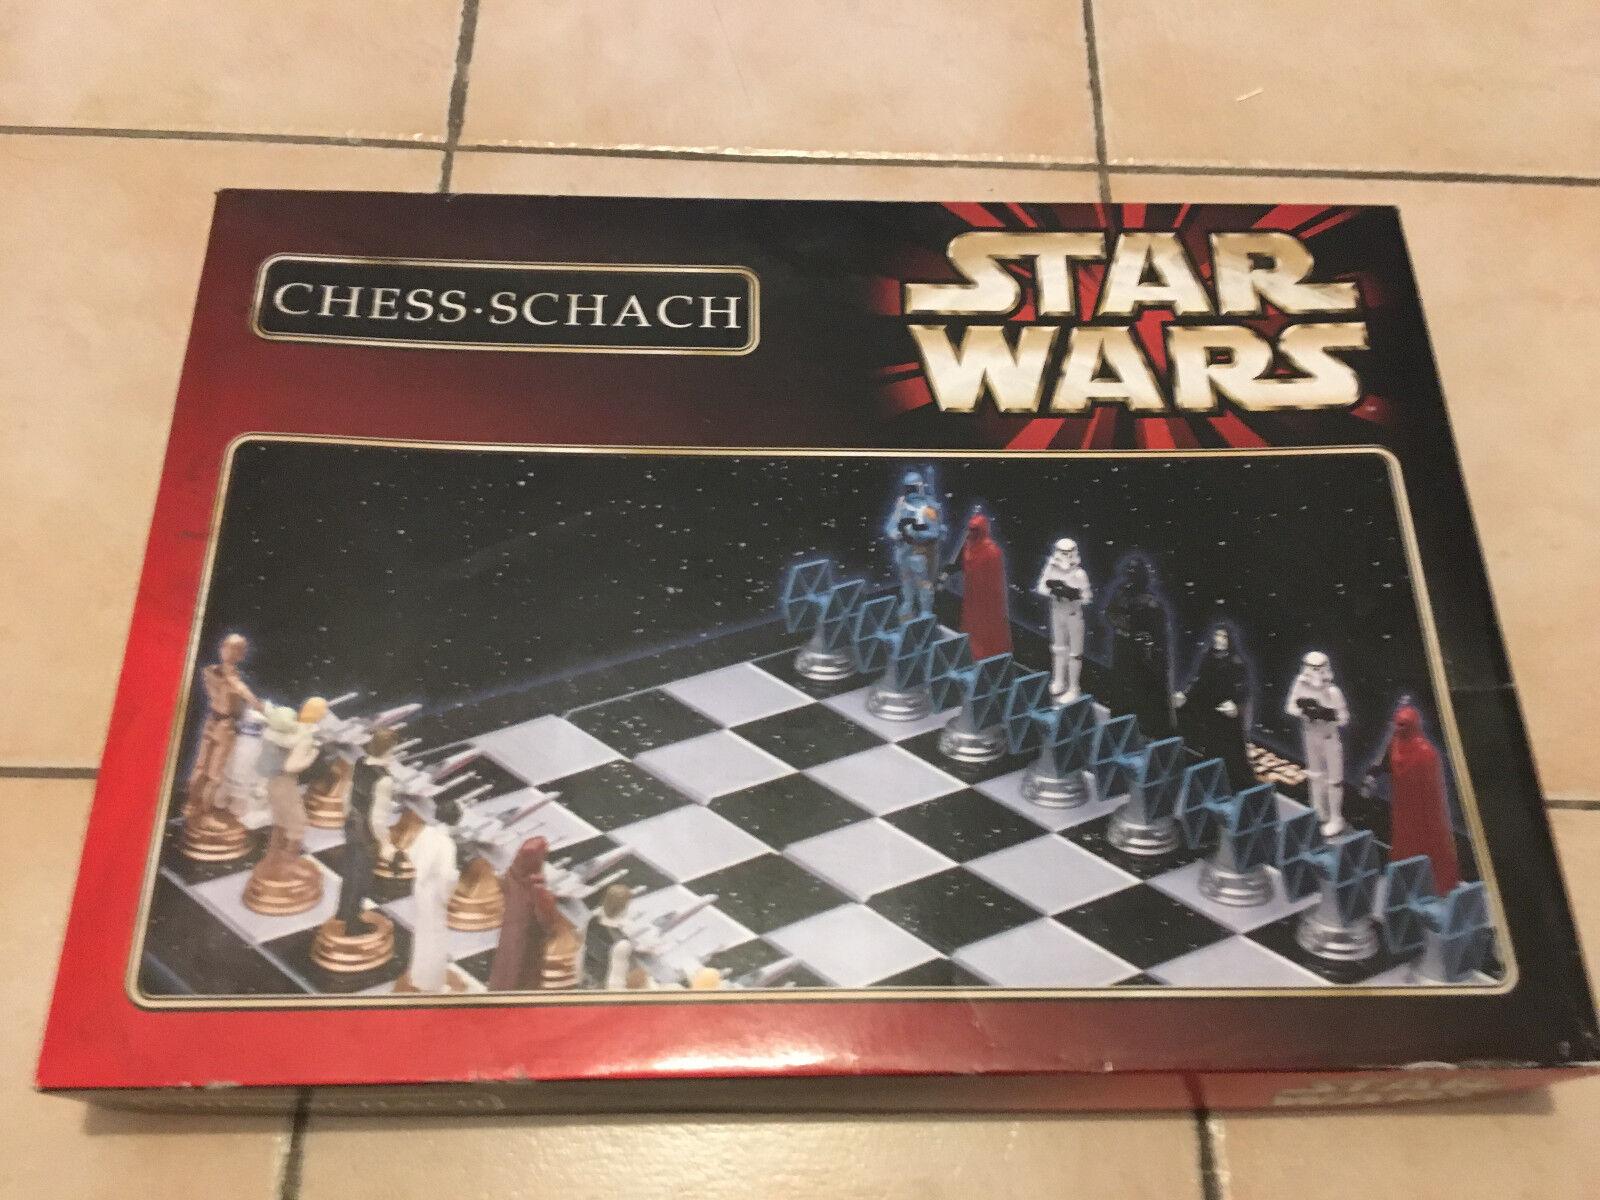 Jeu d'échecs STAR WARS - Chess - complet   Collector